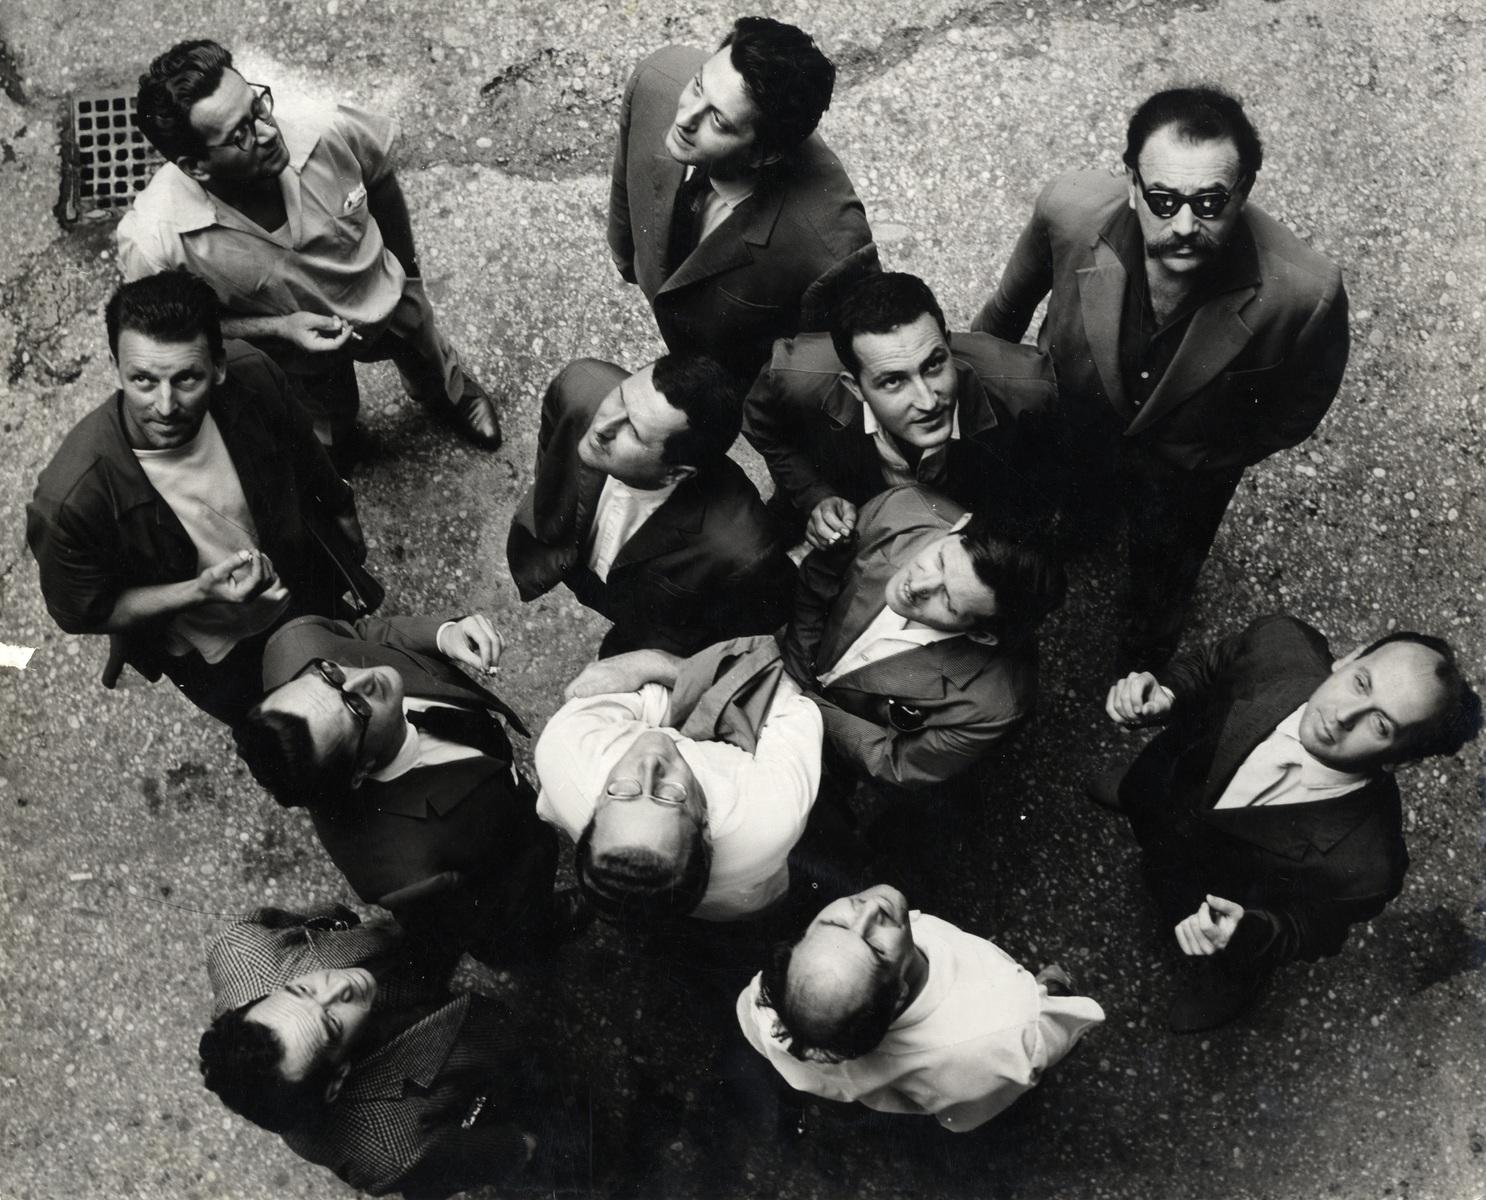 Gorgona Group, Gorgona is Looking at the Sky, 1961, Marinko Sudac Collection